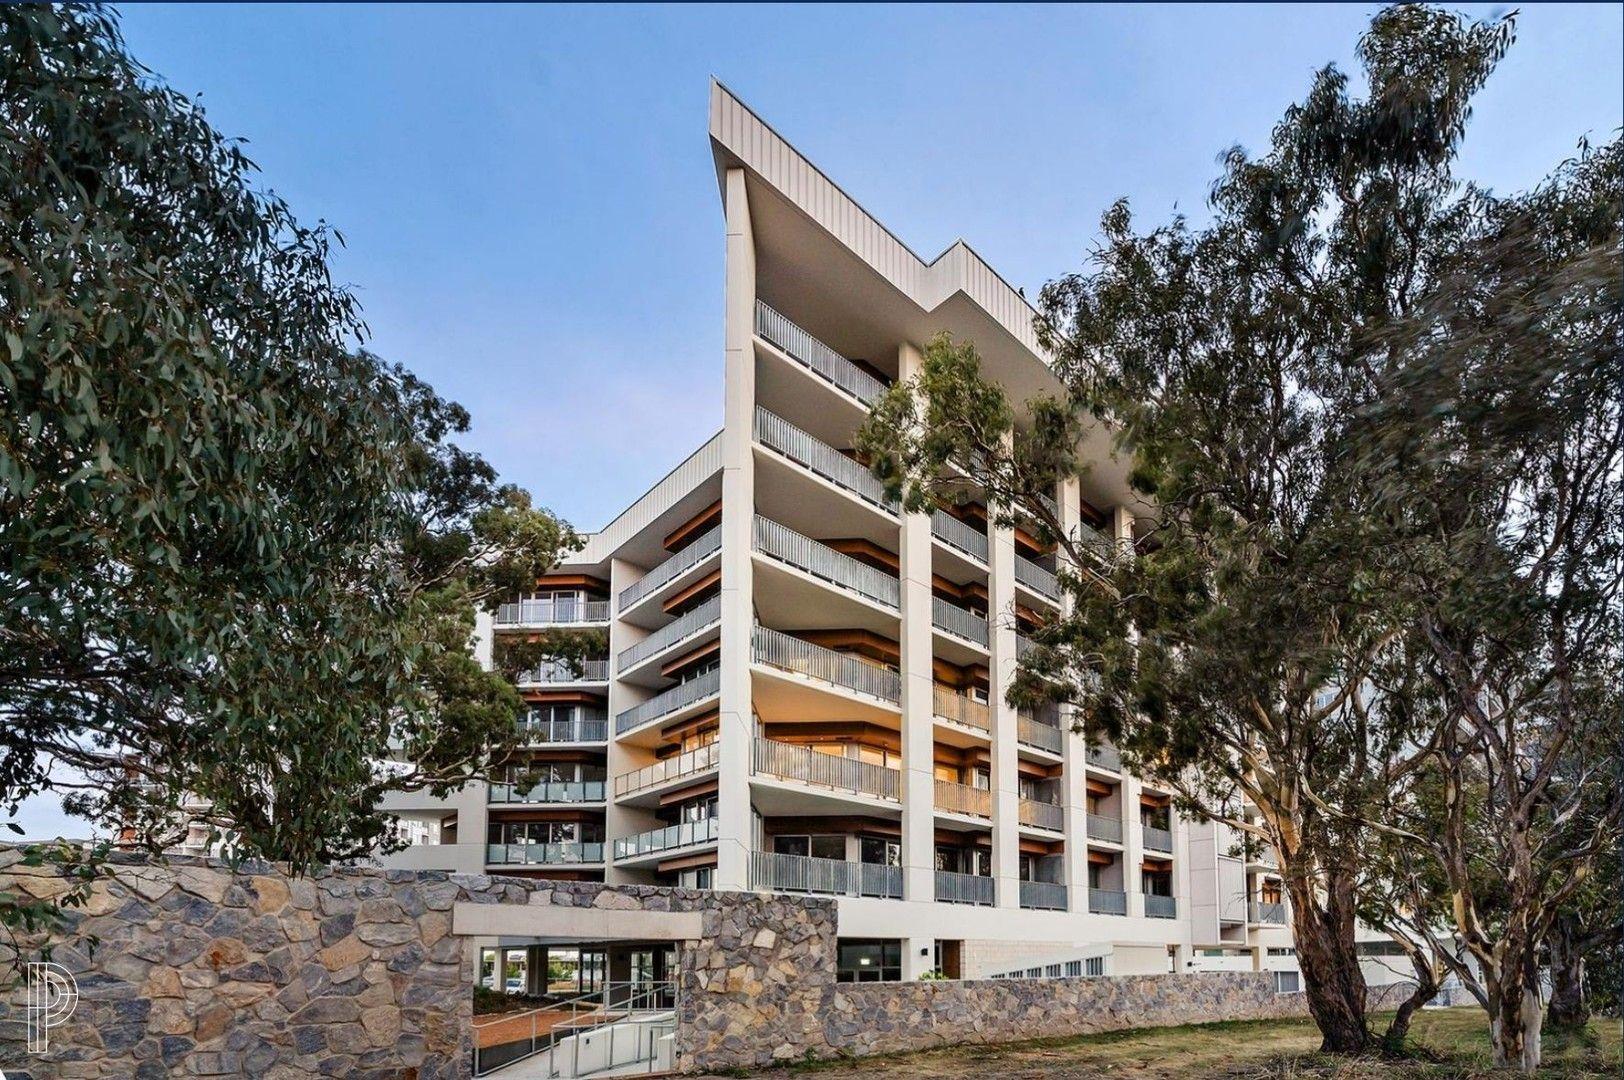 2 bedrooms Apartment / Unit / Flat in 411/100 Swain Street GUNGAHLIN ACT, 2912